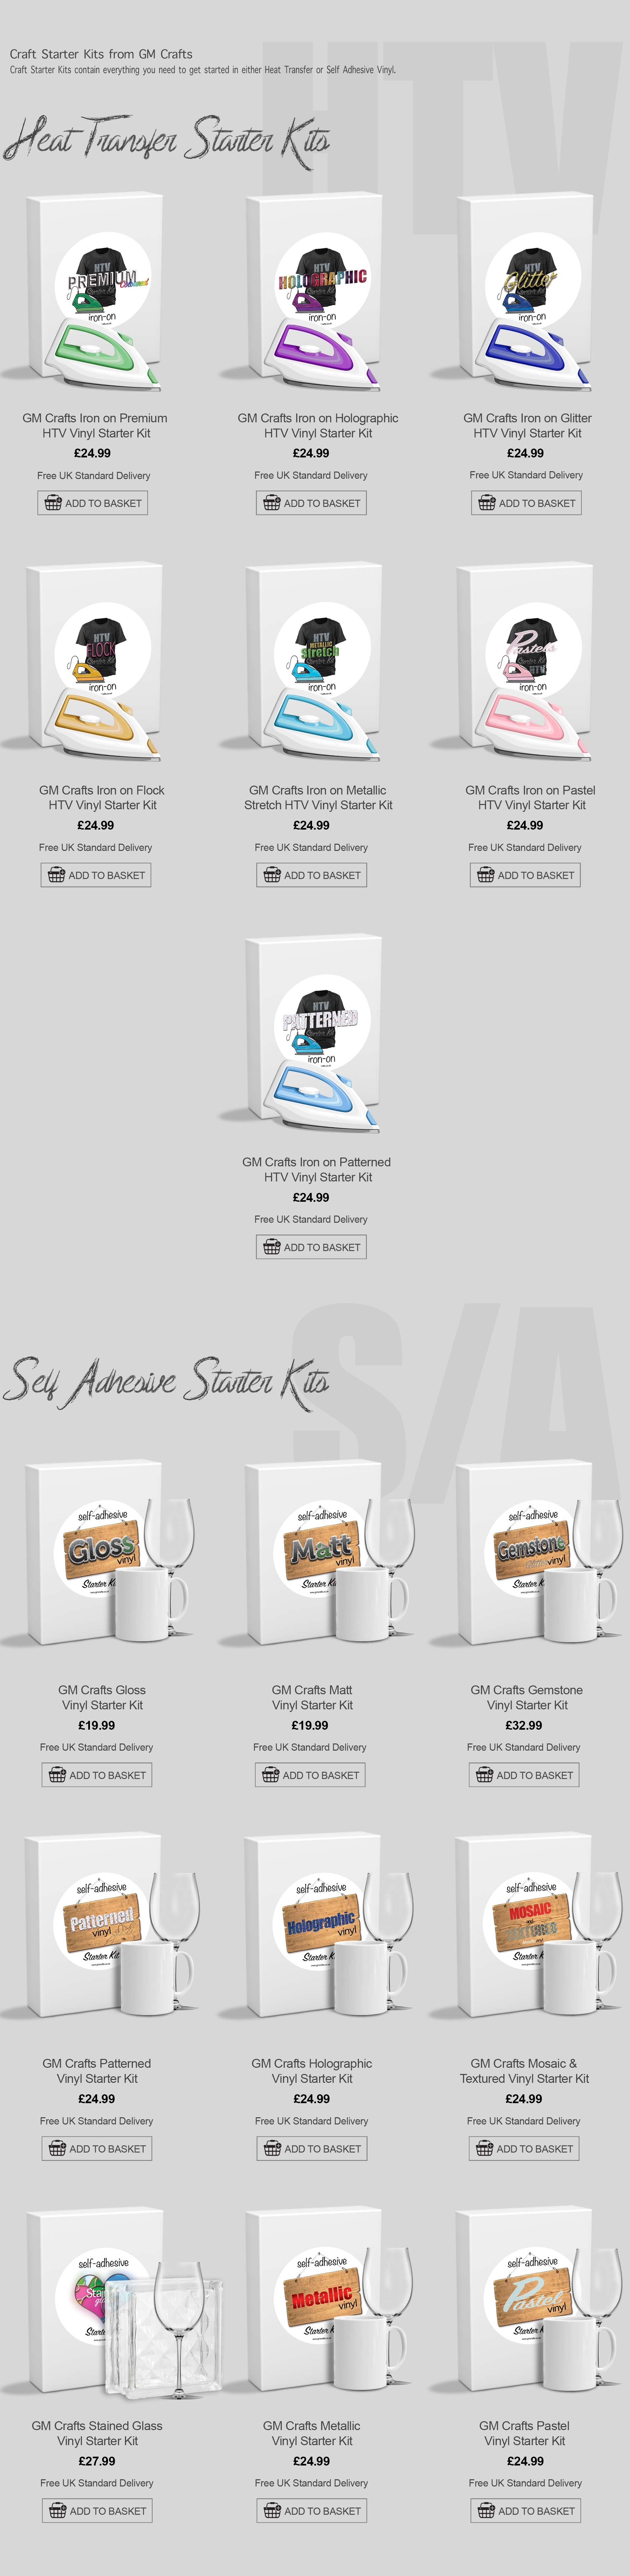 Desktop-Starter-Kits-Page